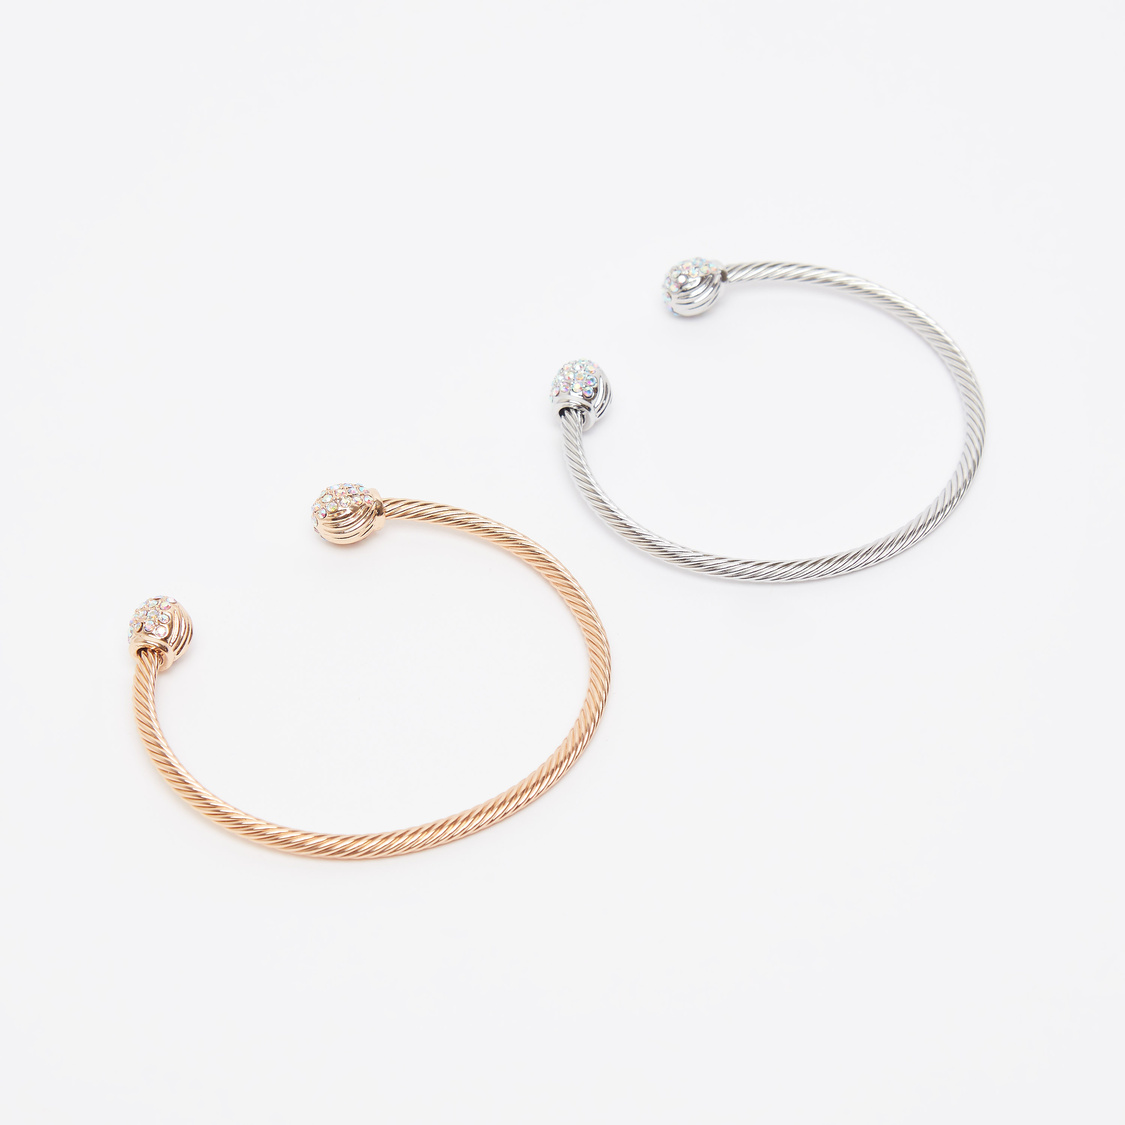 Set of 2 - Embellished Open Cuff Bangles